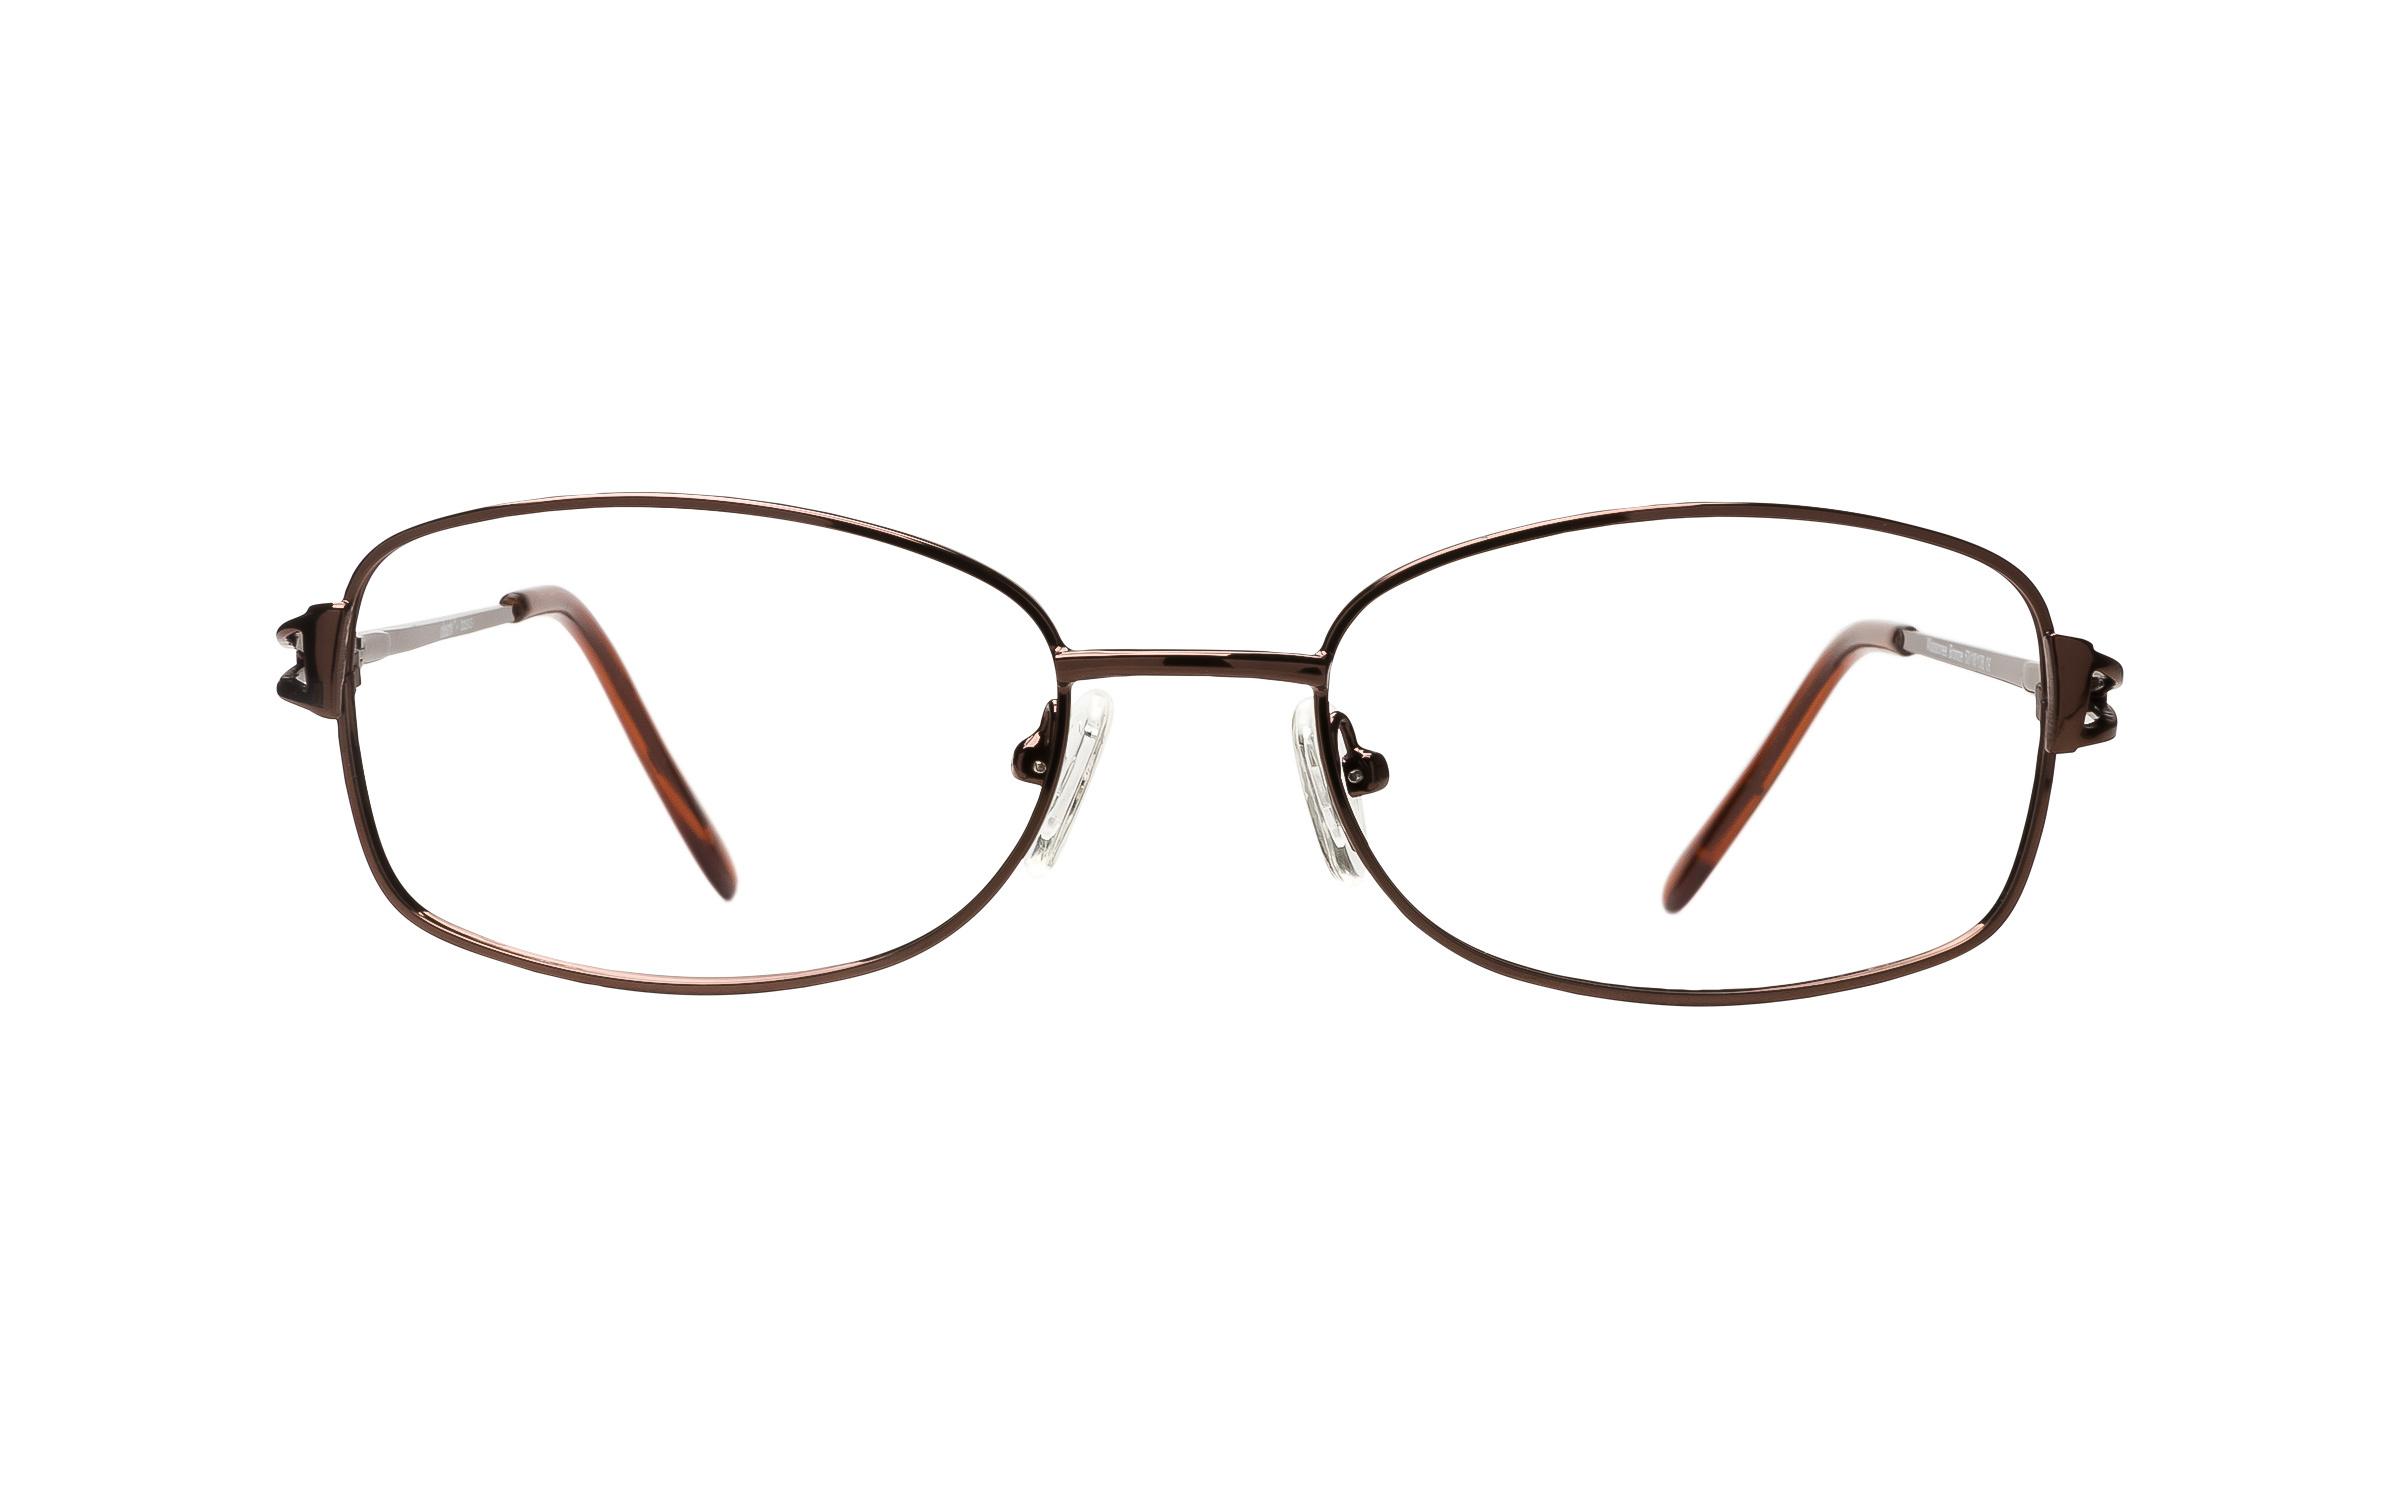 Clearly Basics Moosonee (52) Eyeglasses and Frame in Bronze Brown | Plastic - Online Coastal